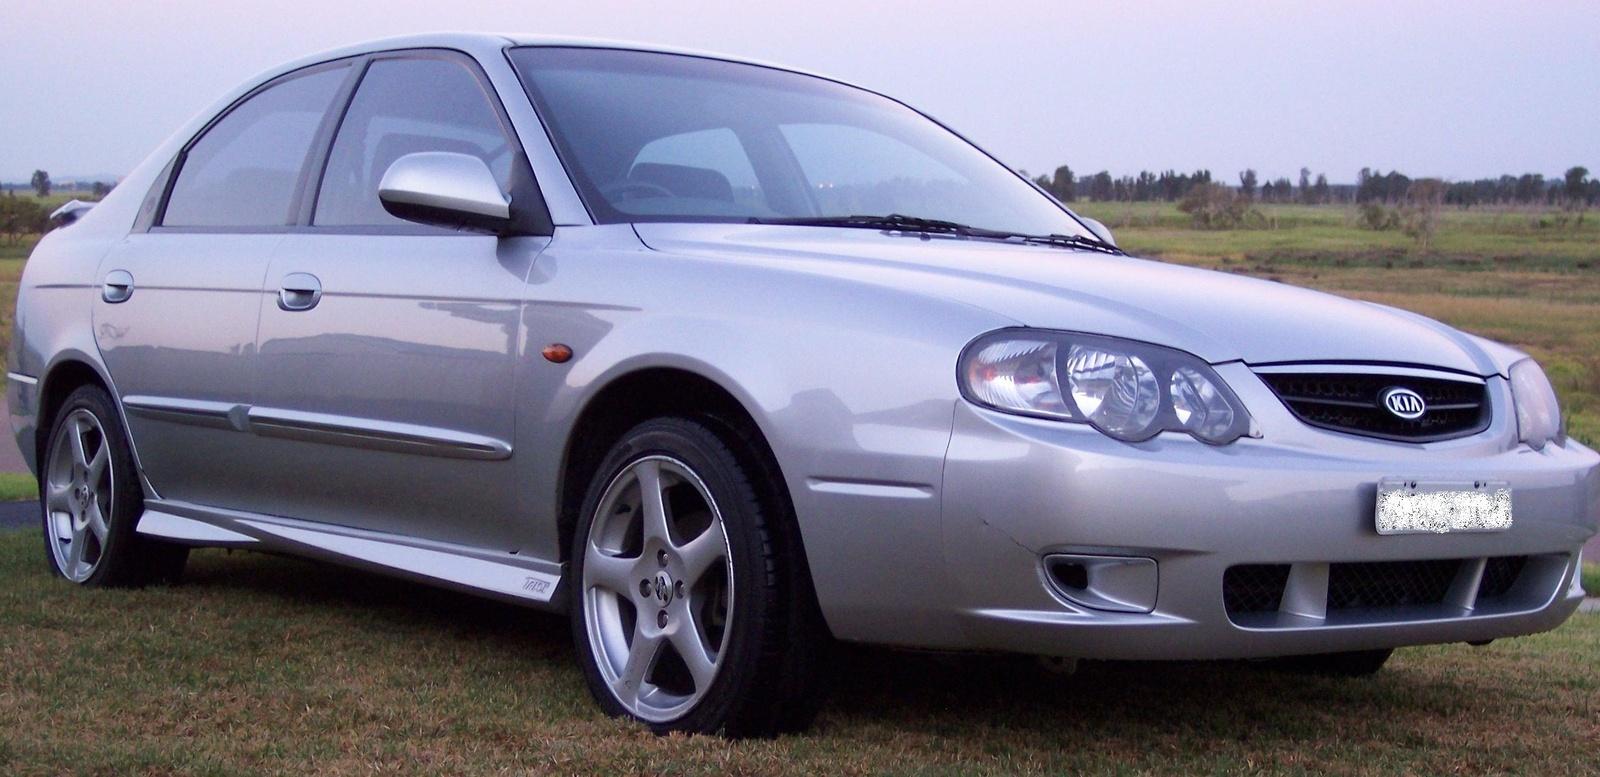 Autos World For All: Kia 2001